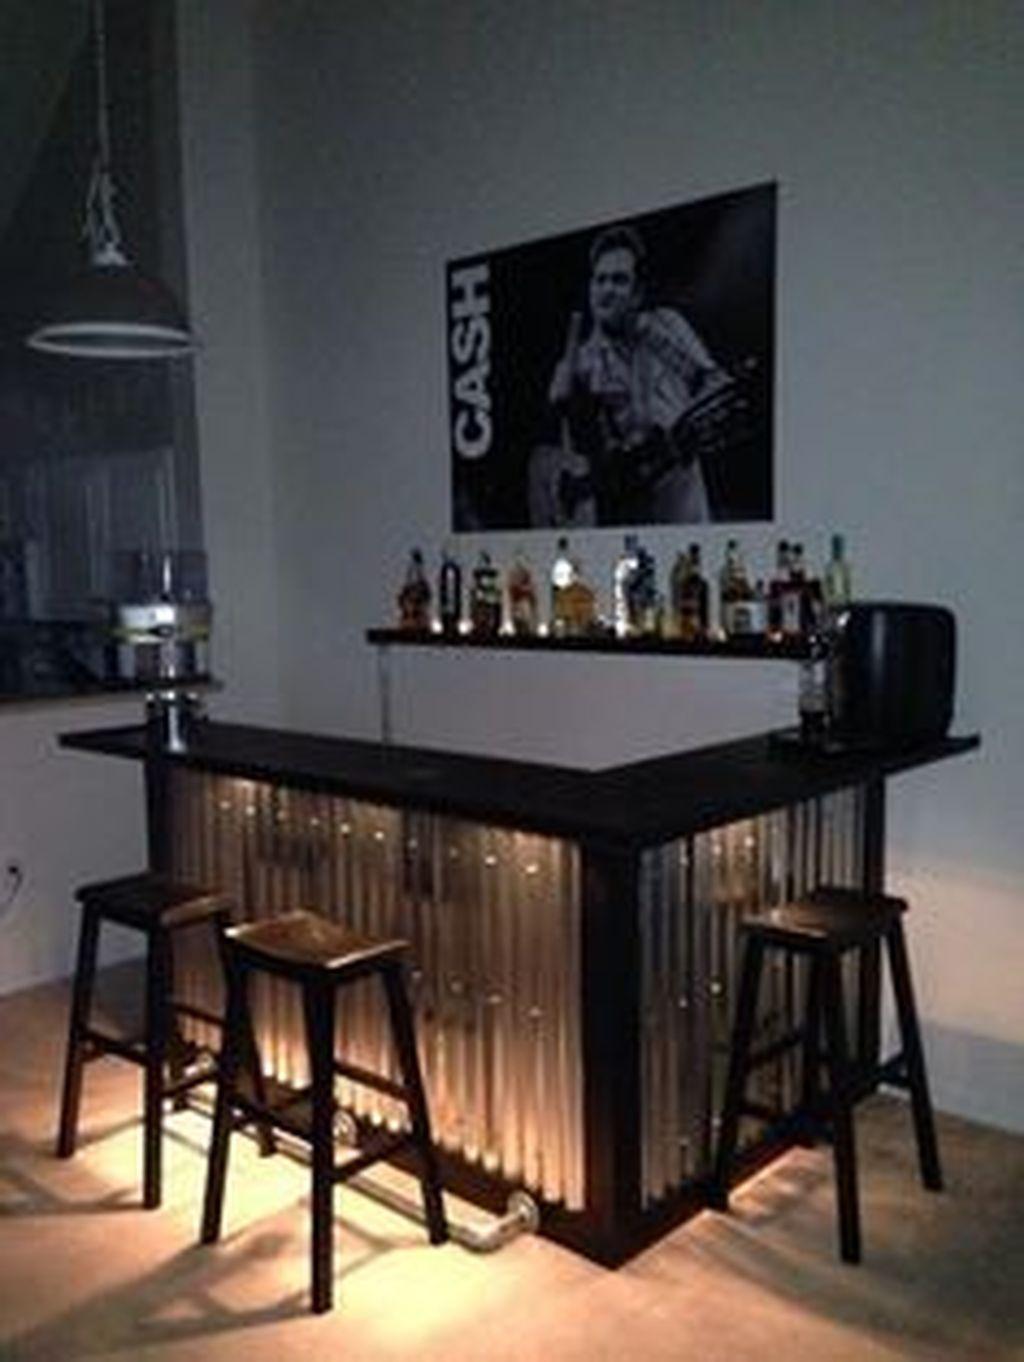 basement bar decor ideas on 30 Outstanding Rustic Home Bar Design Ideas Trenduhome Home Bar Decor Diy Home Bar Bars For Home